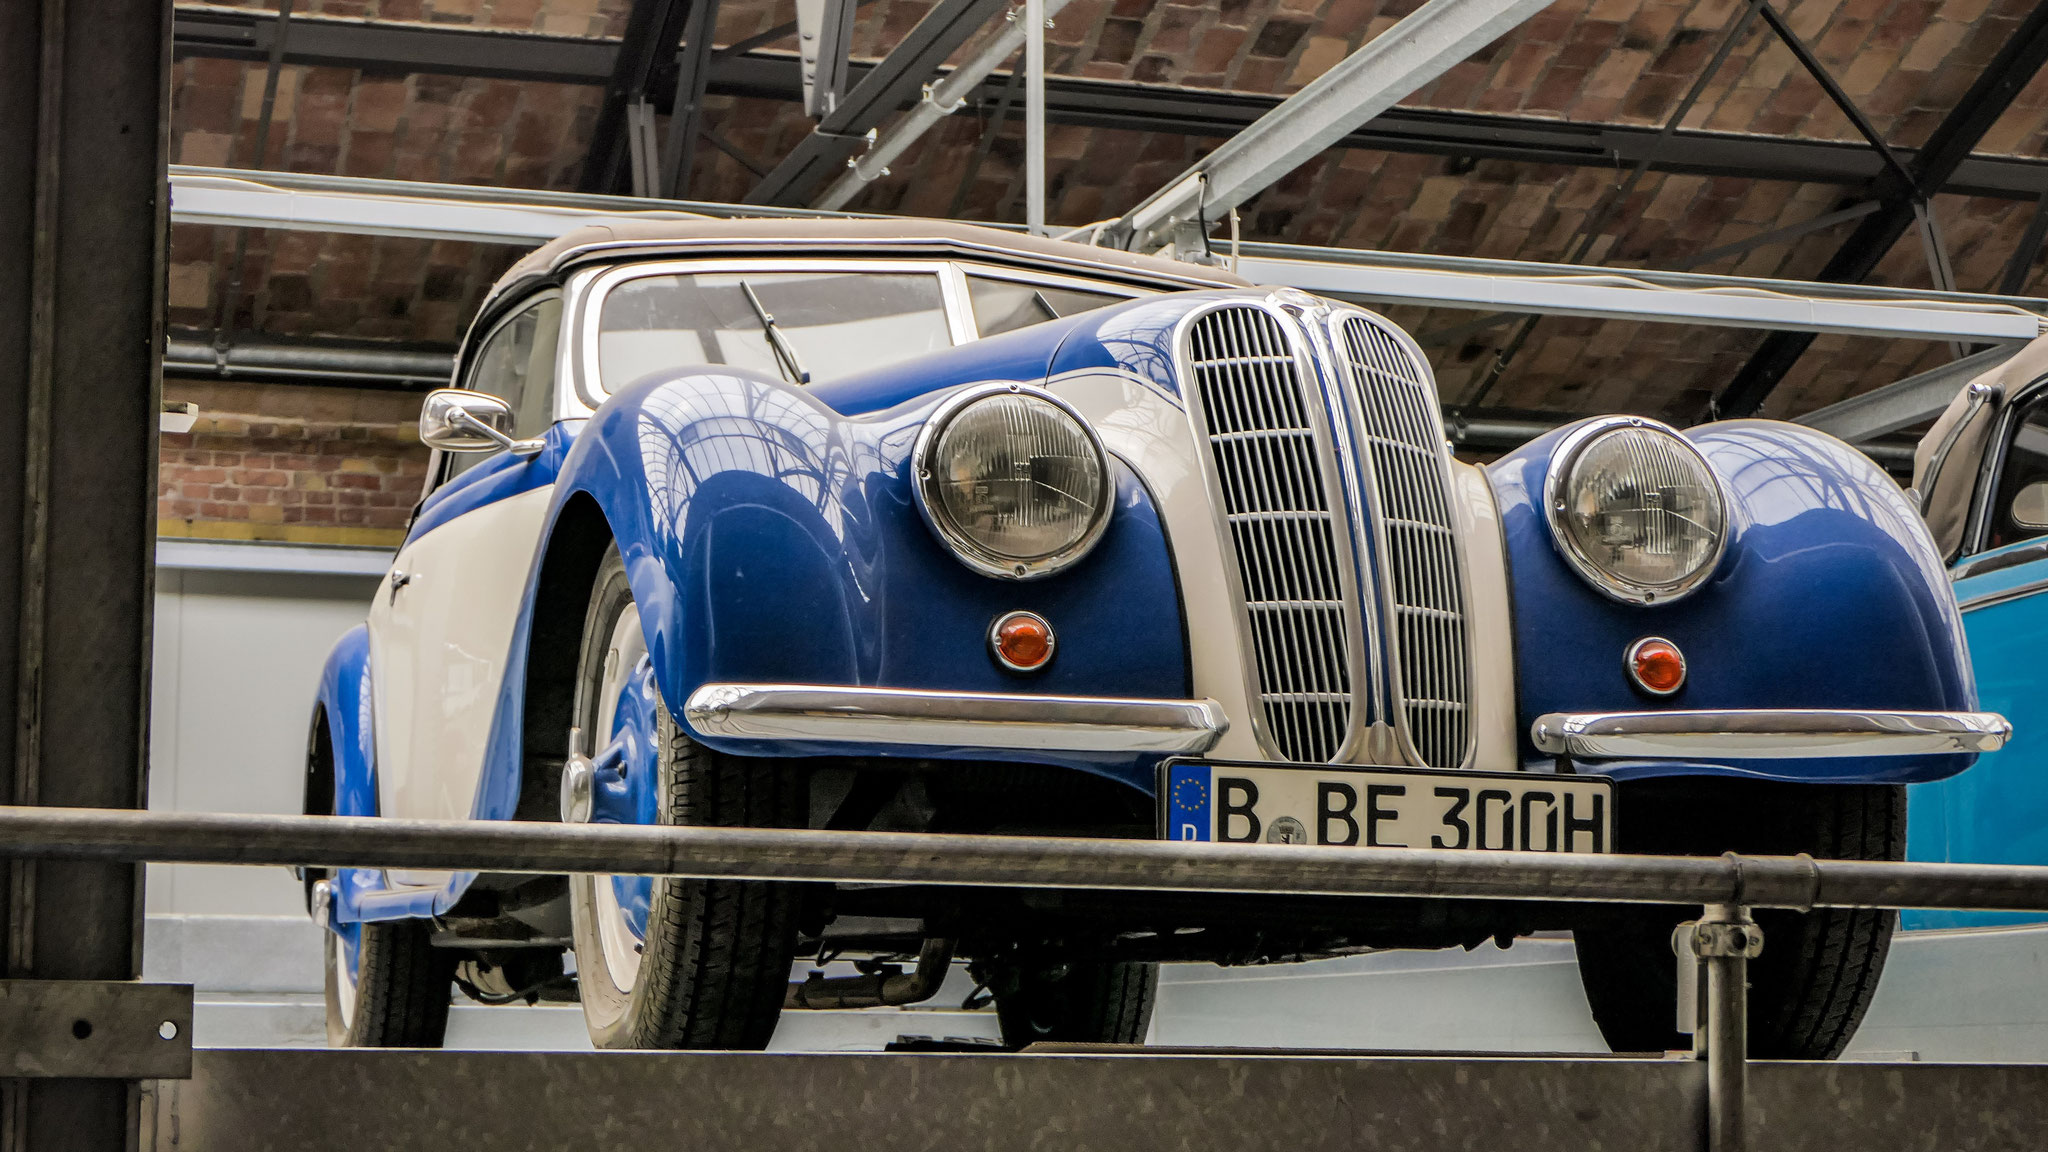 BMW 327 Sportkabriolett - B-BE-300H